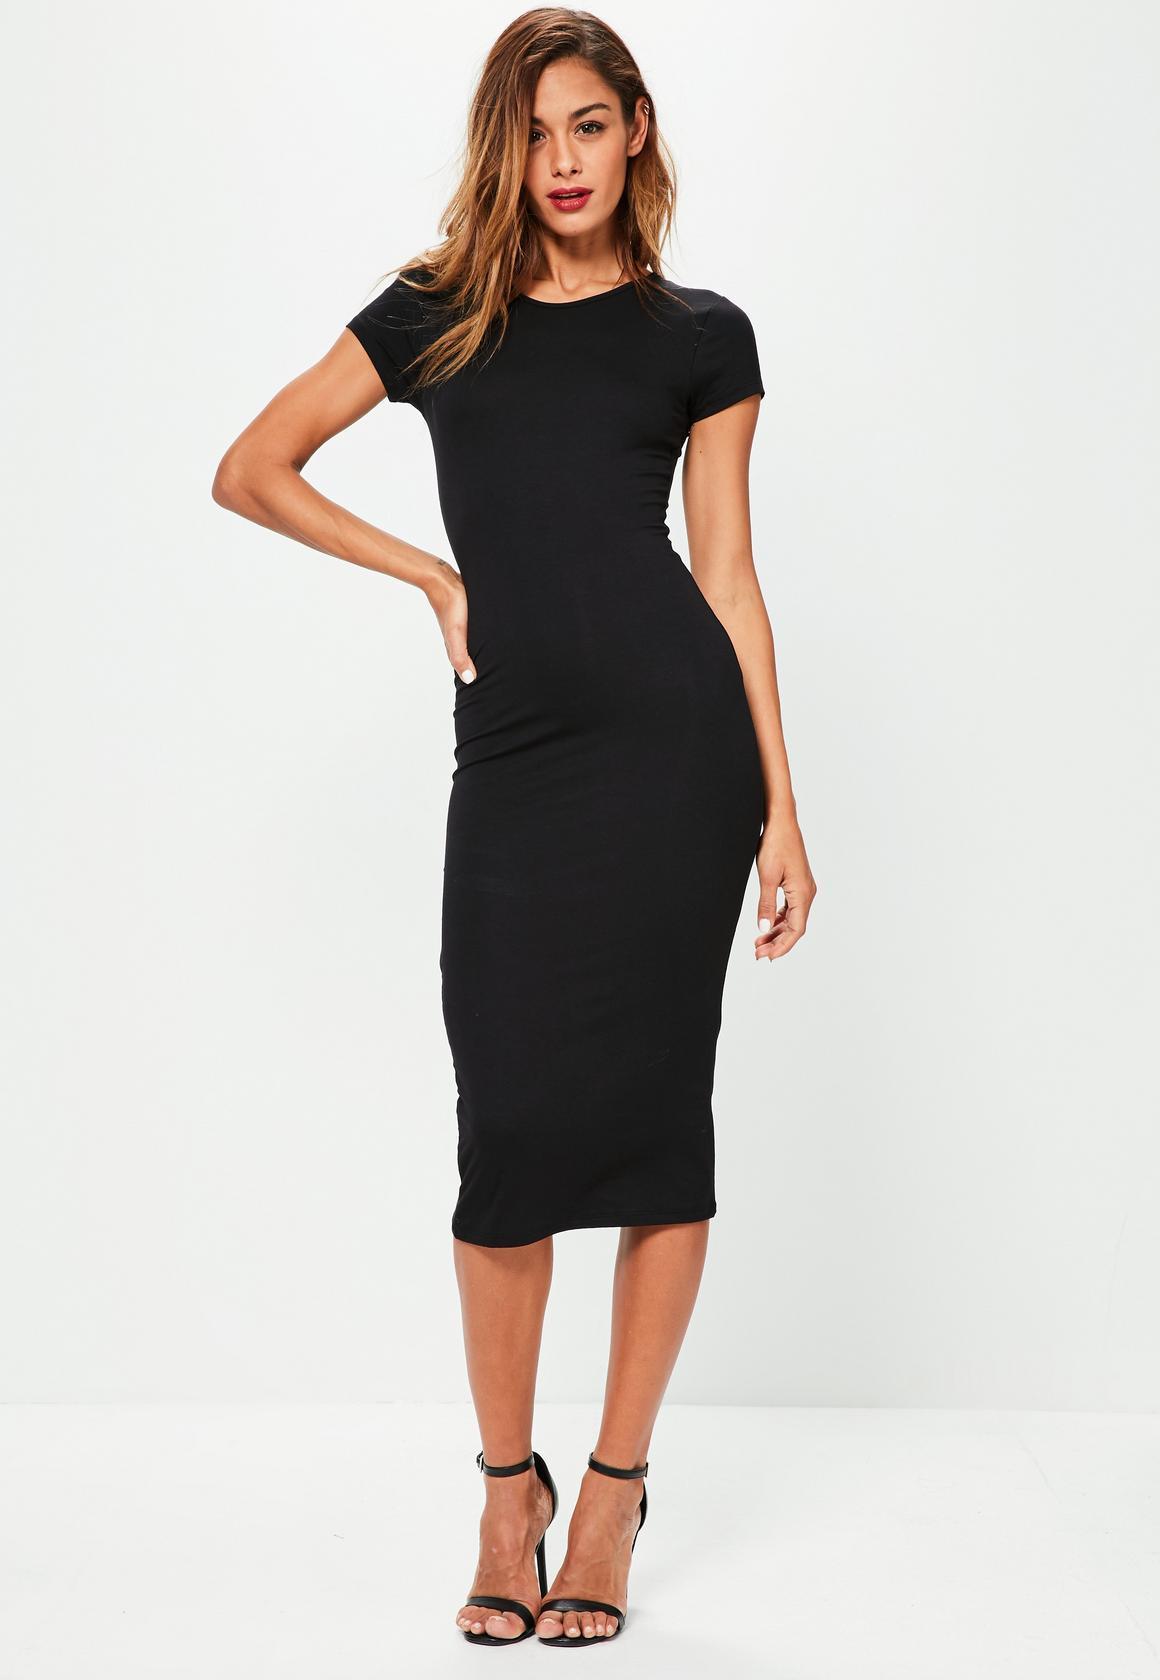 Robe noir manche courte